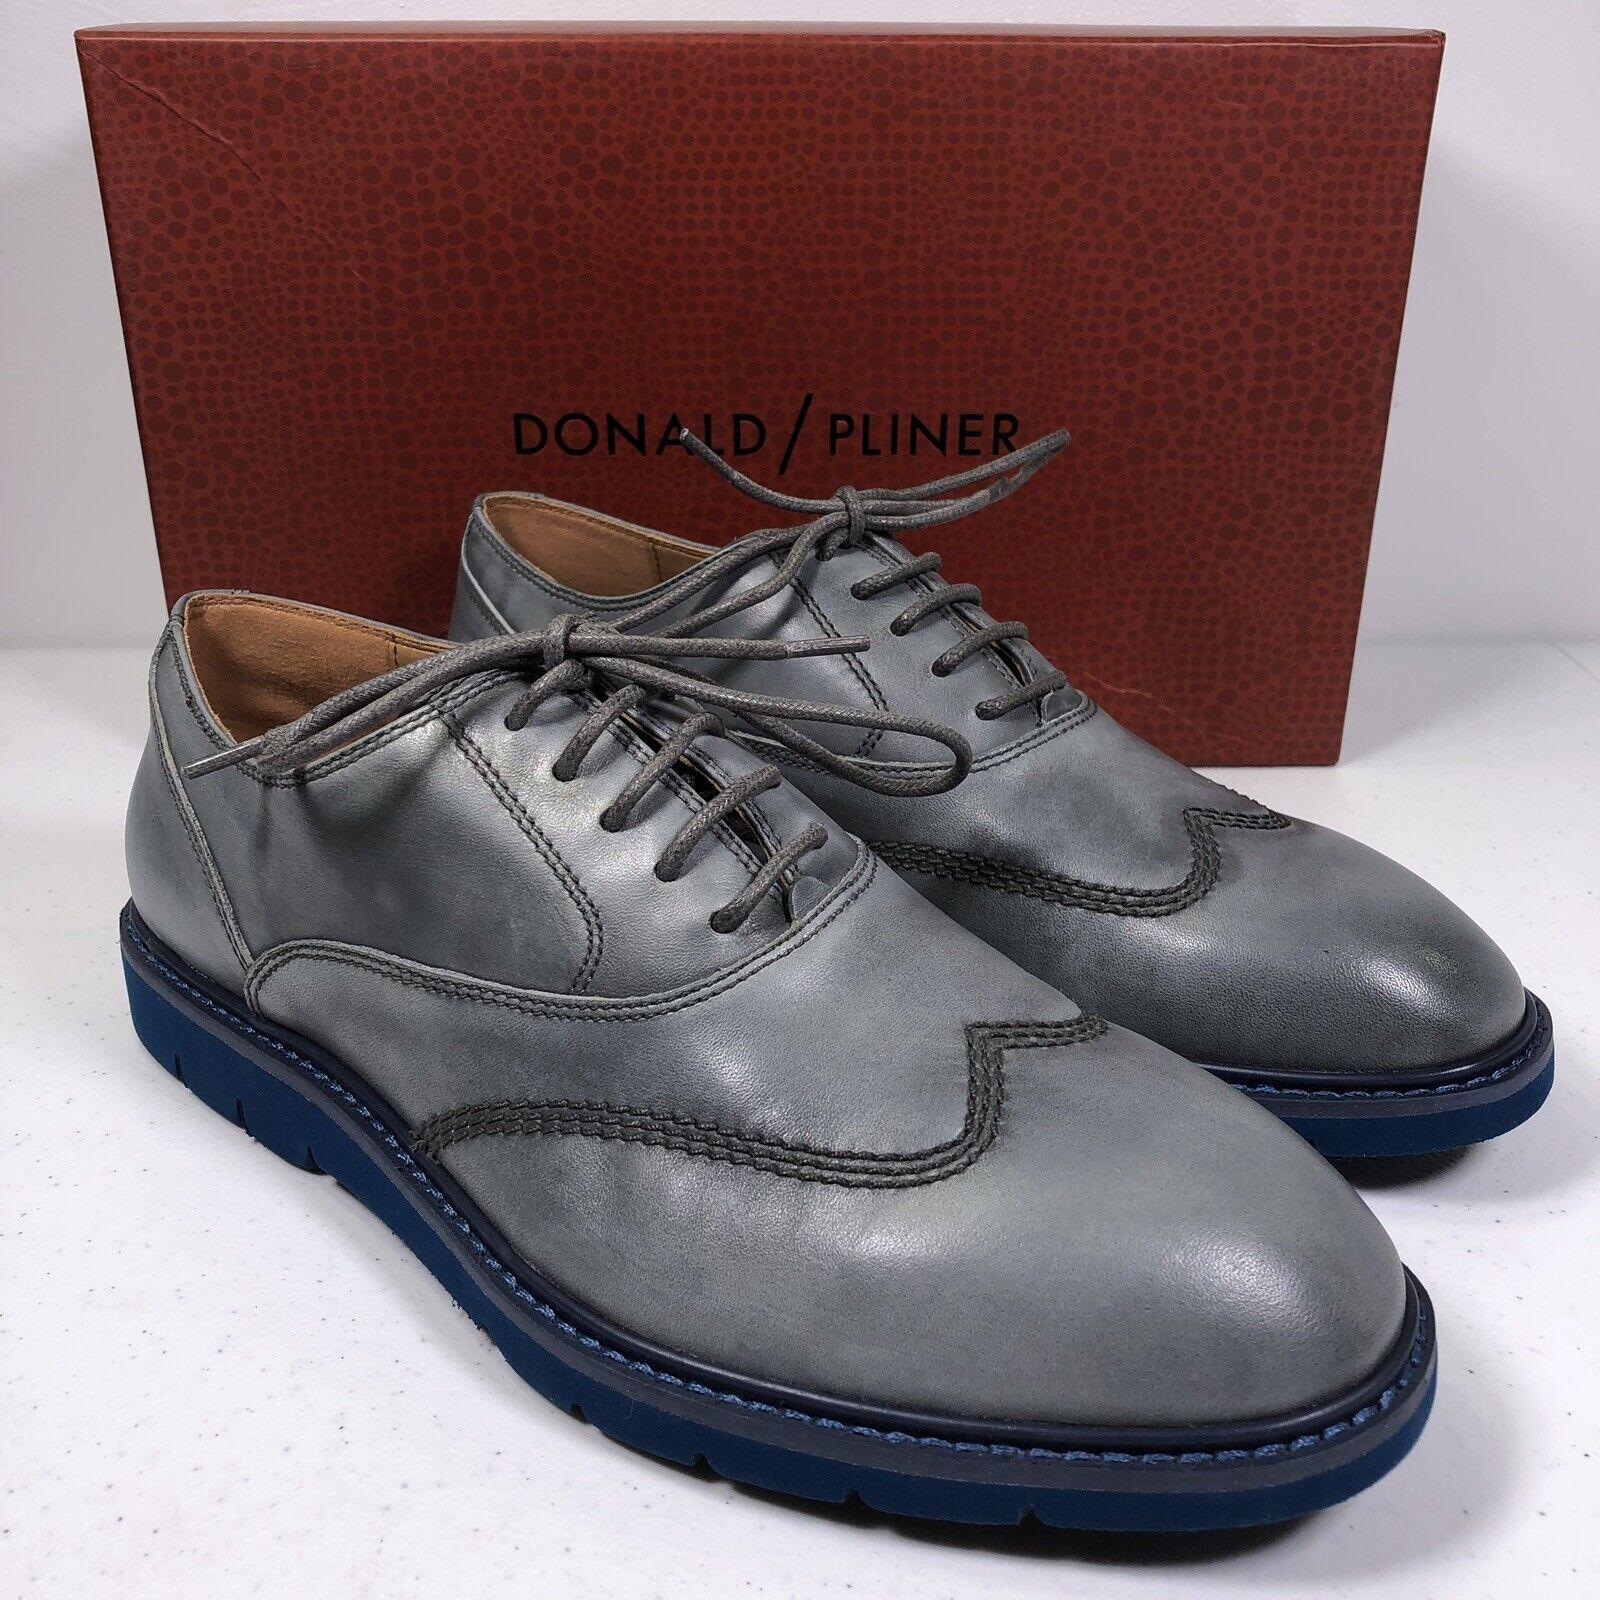 Donald Pliner Men's Sennet Oxford Wingtip shoes bluee Grey